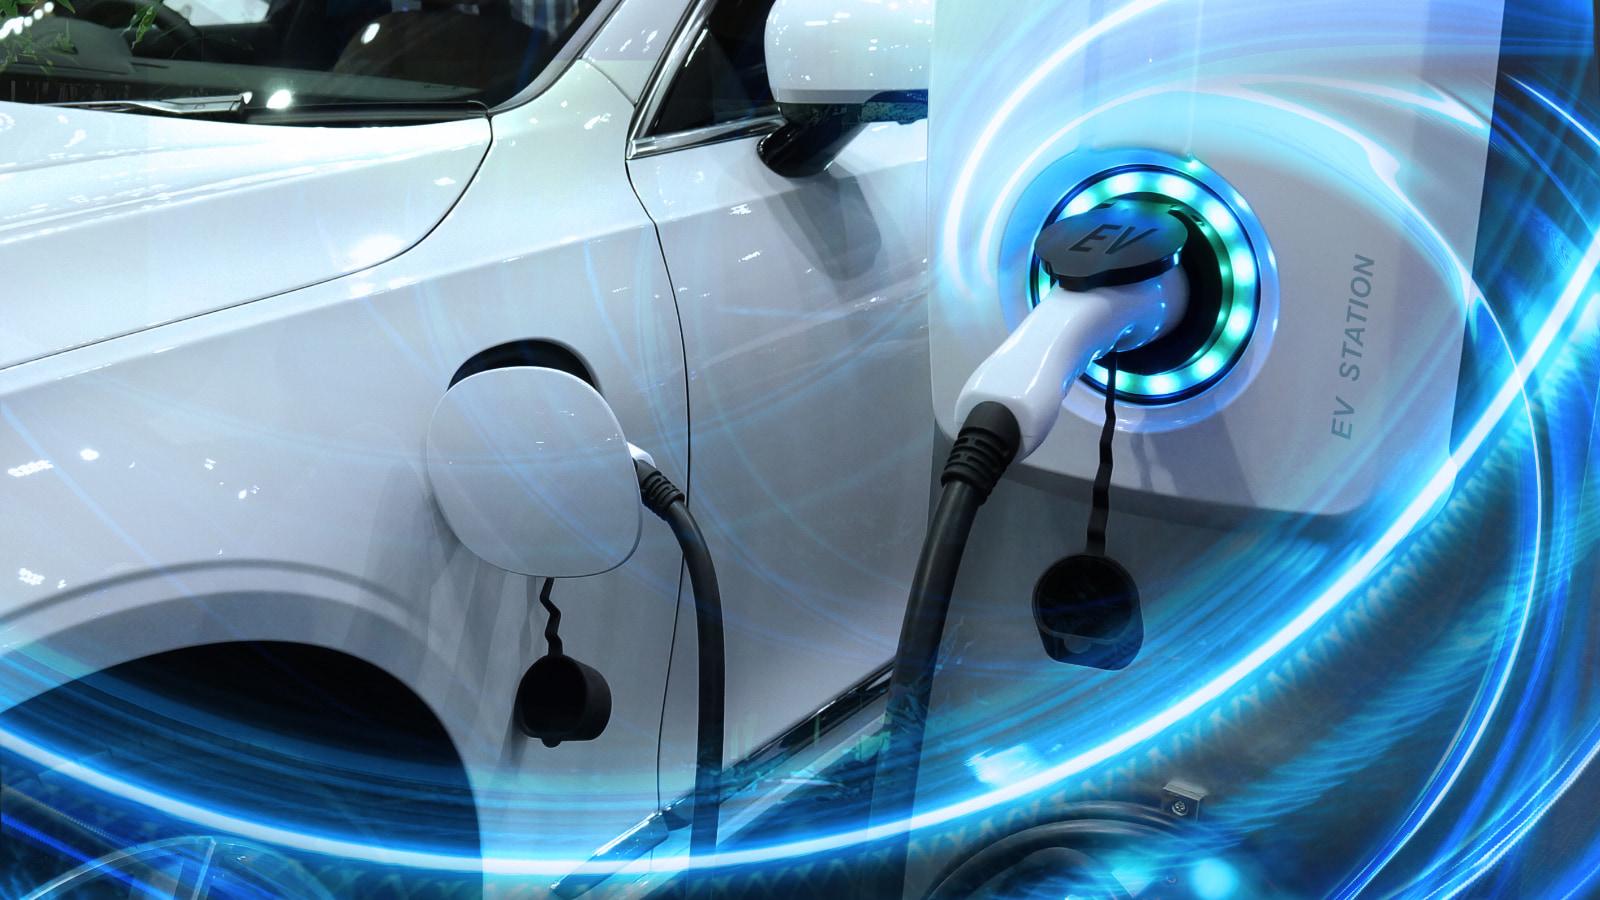 5Gスマホ・電気自動車時代に対応。バッテリー高性能化ソフトウェアQnovo